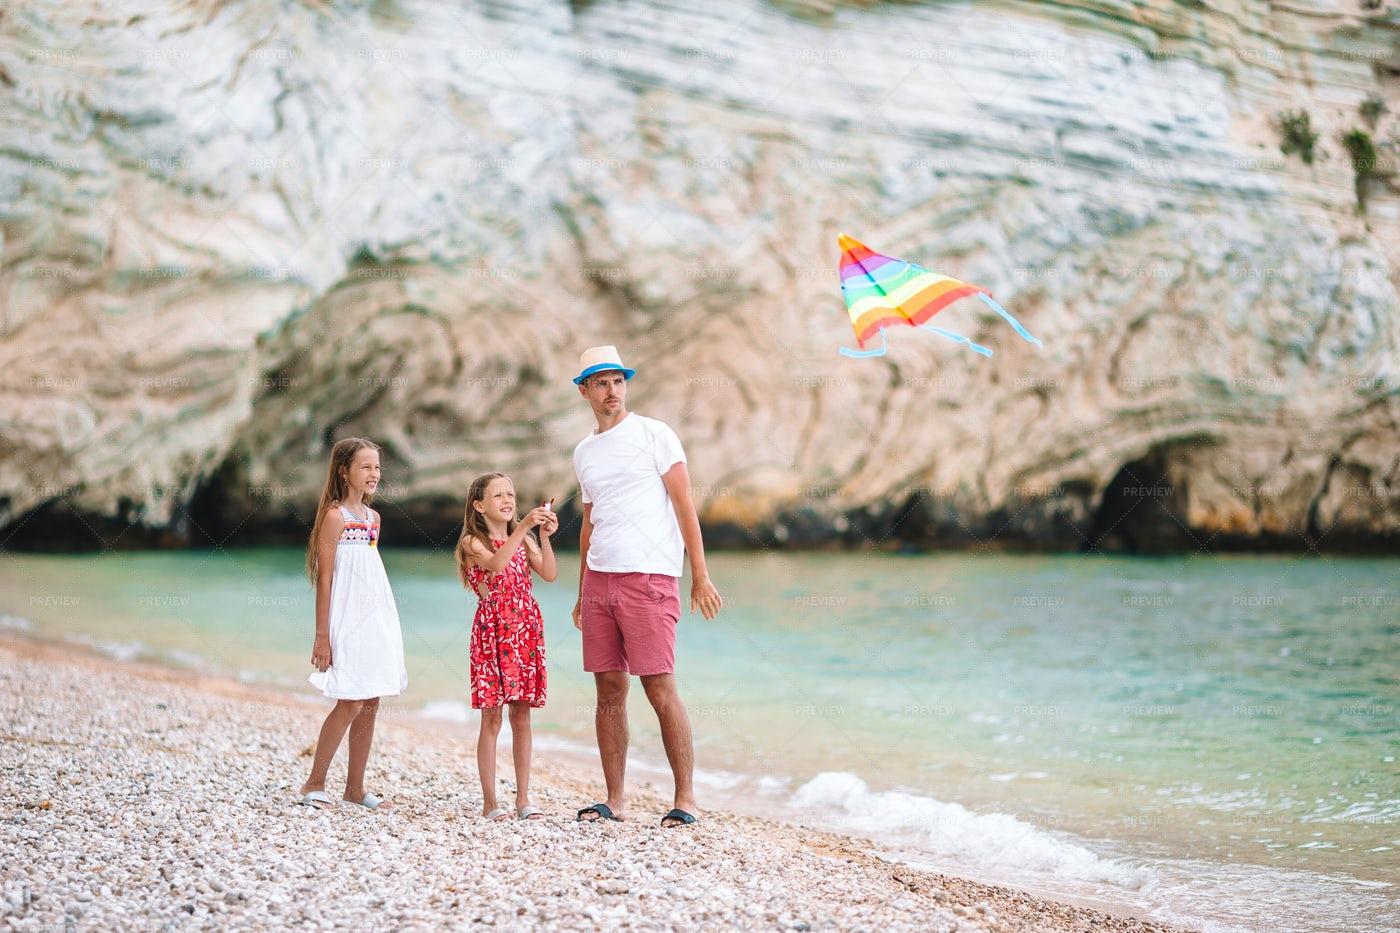 Family Kite Flying: Stock Photos